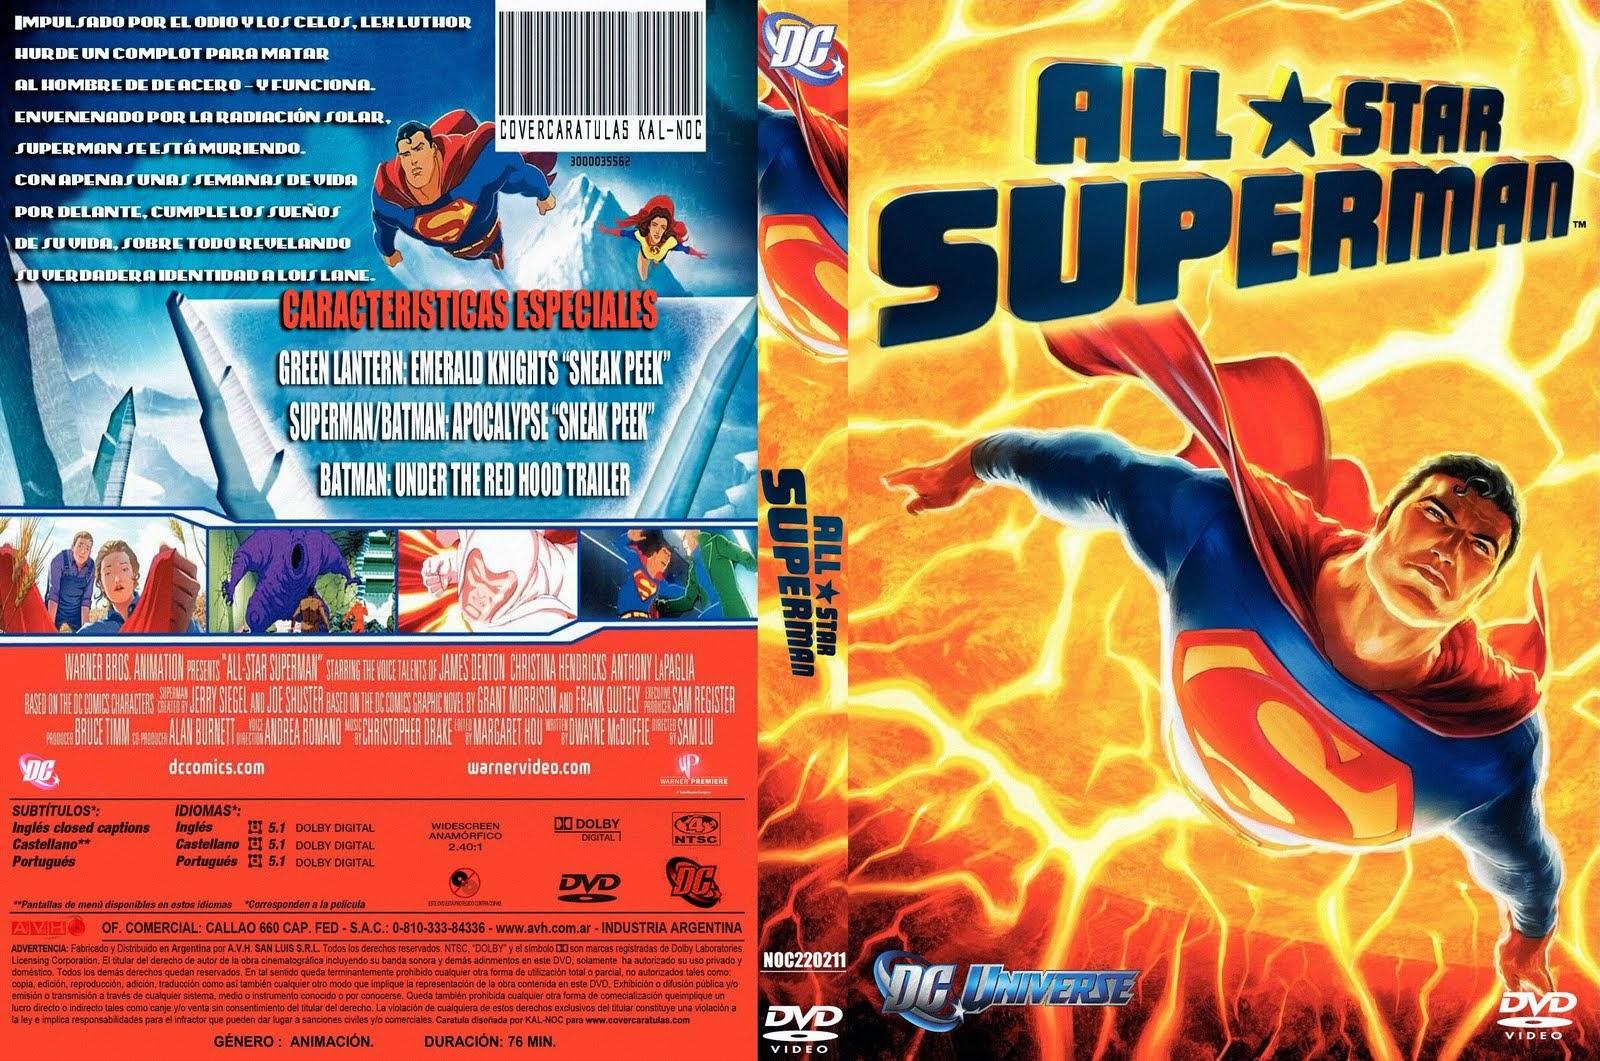 All Star Superman (2011) DVD5